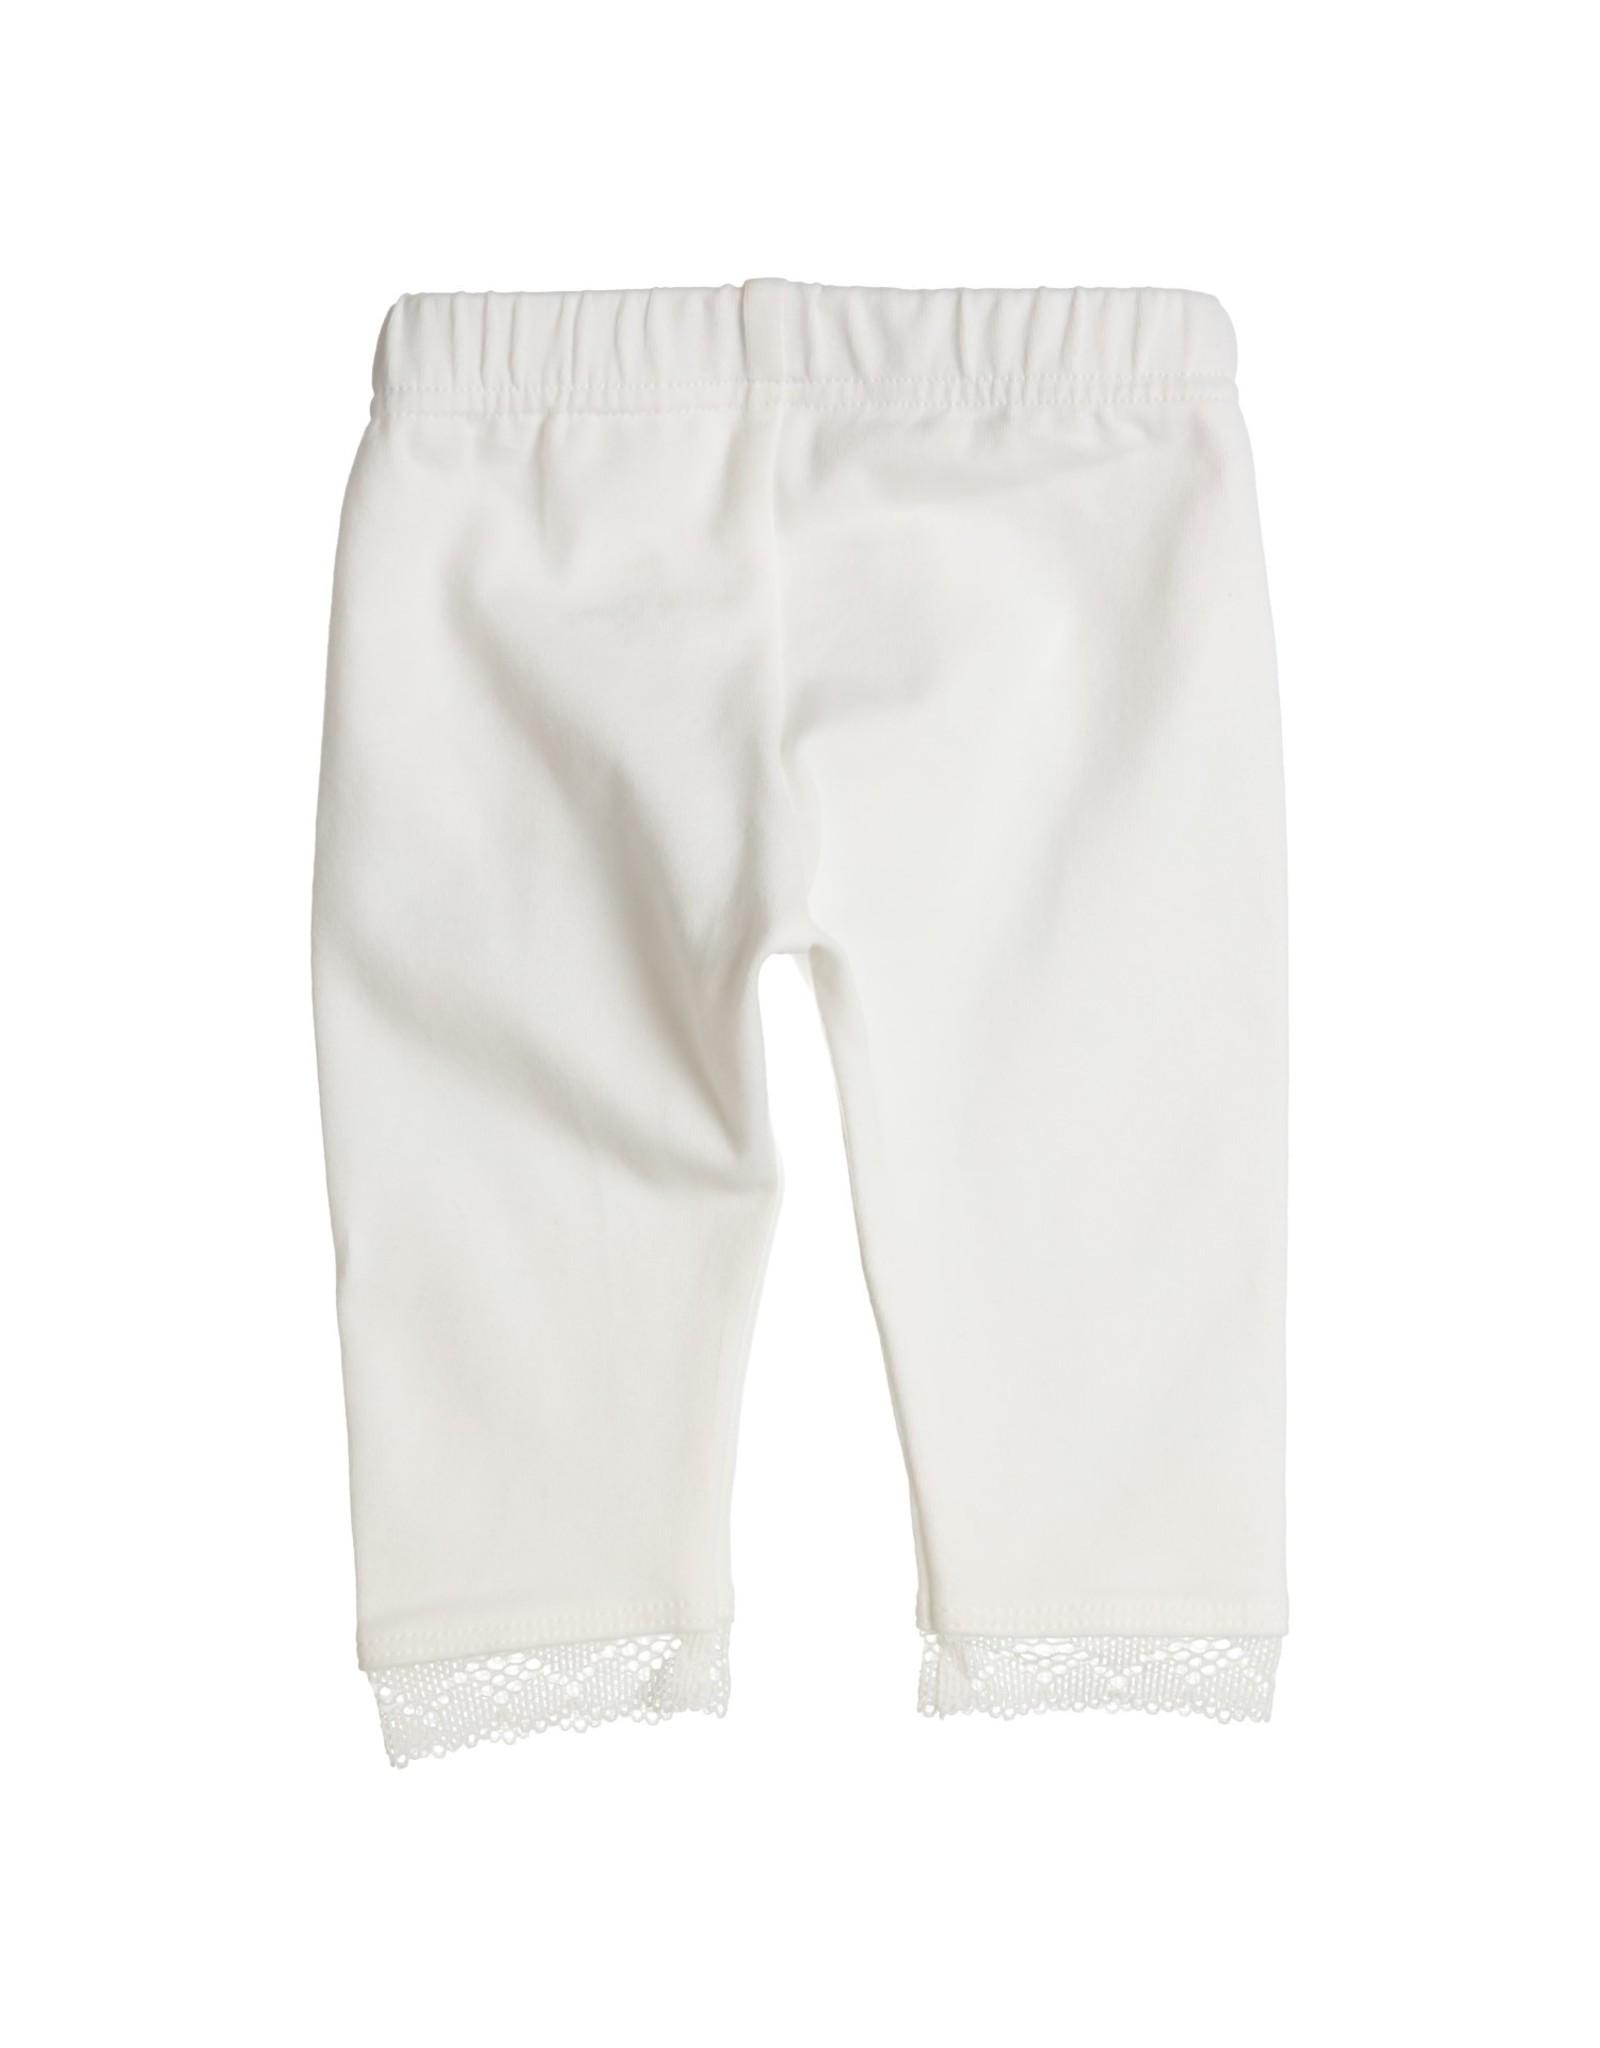 Gymp Legging - Lace Ribbon - Aerodo Off-White